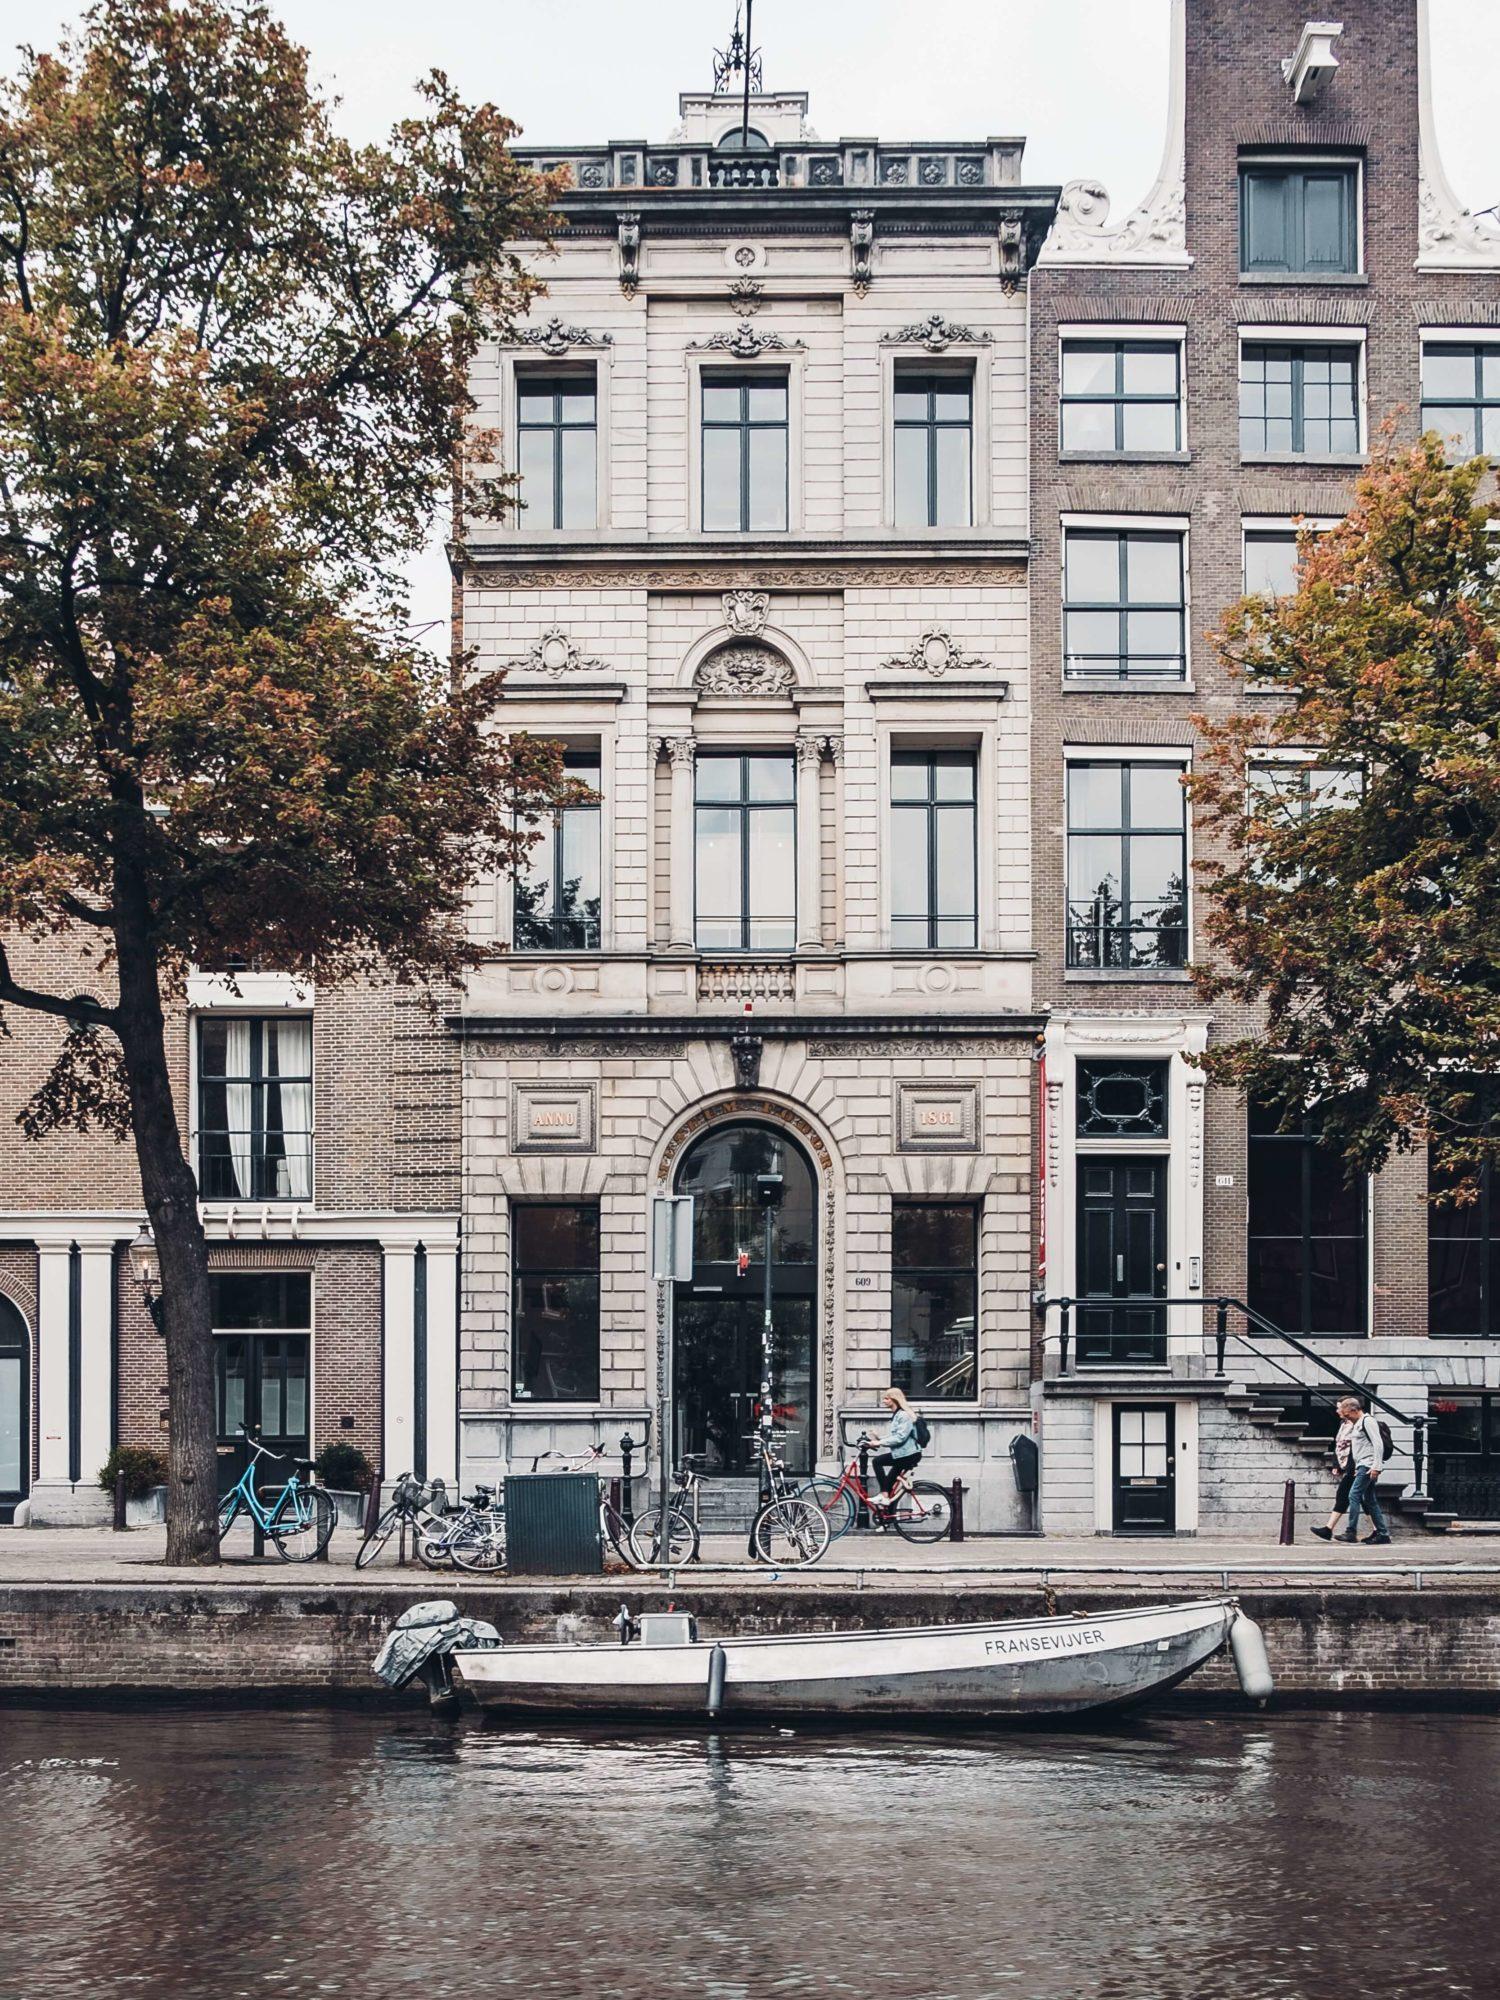 Blog Bilder Amsterdam